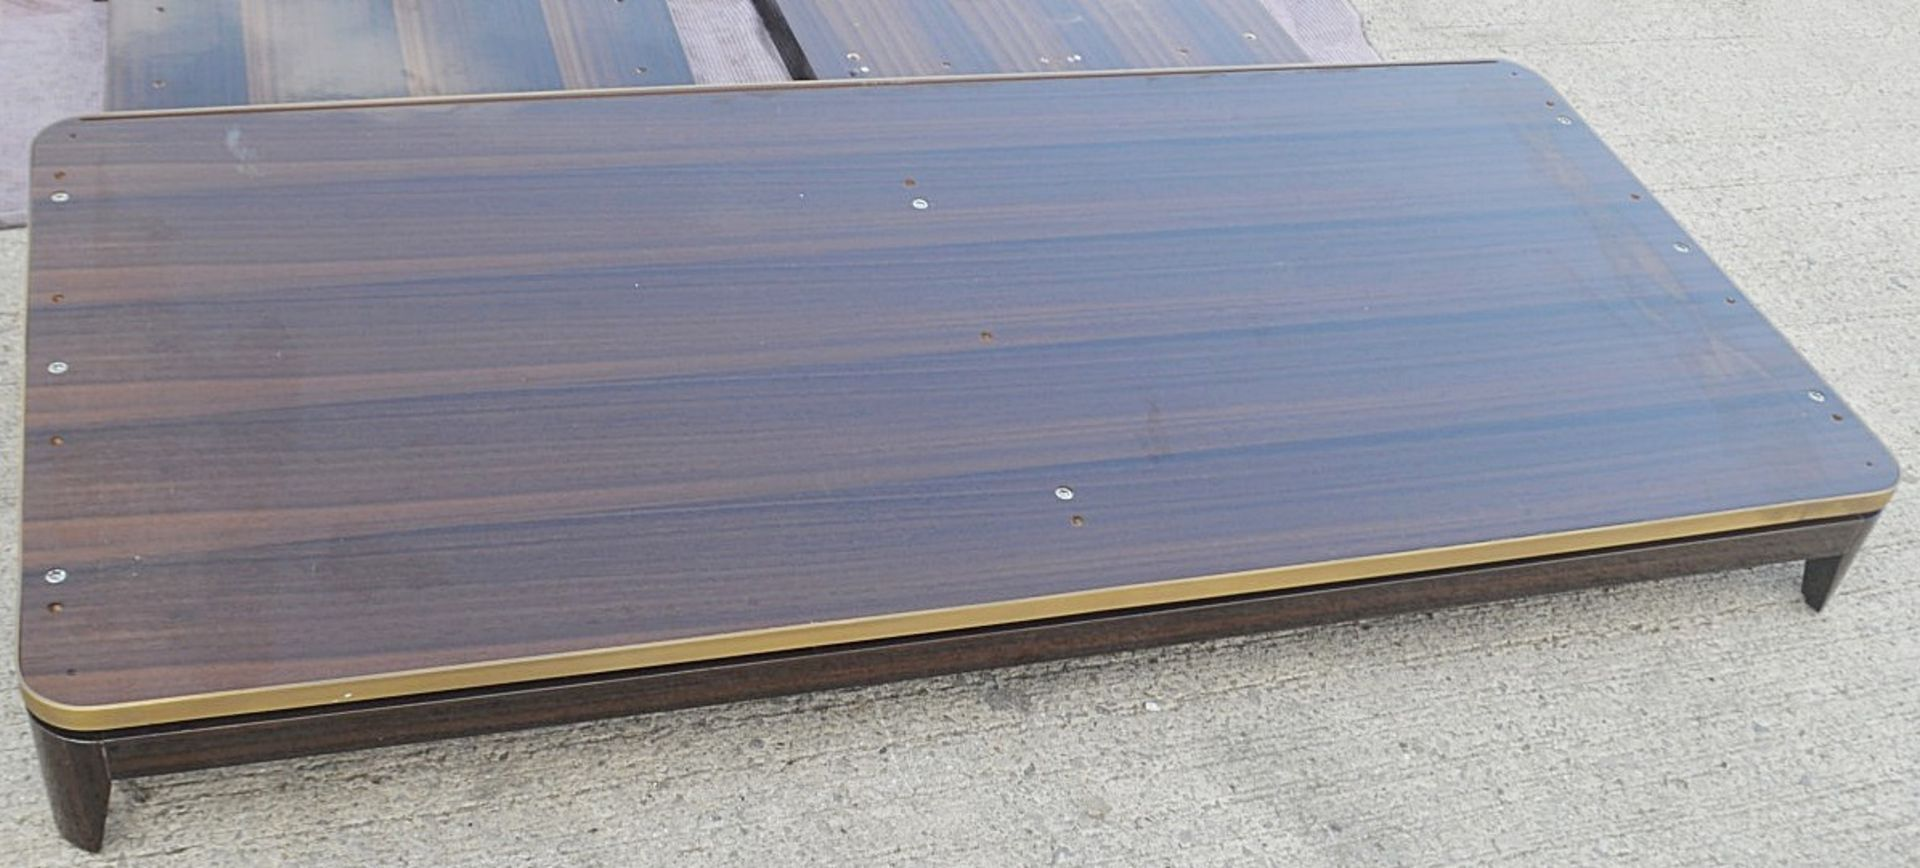 1 x FRATO Bespoke 'Siena' Wardrobe With A High Gloss Brown Wood Veneer Finish - Original RRP £18,890 - Image 3 of 21